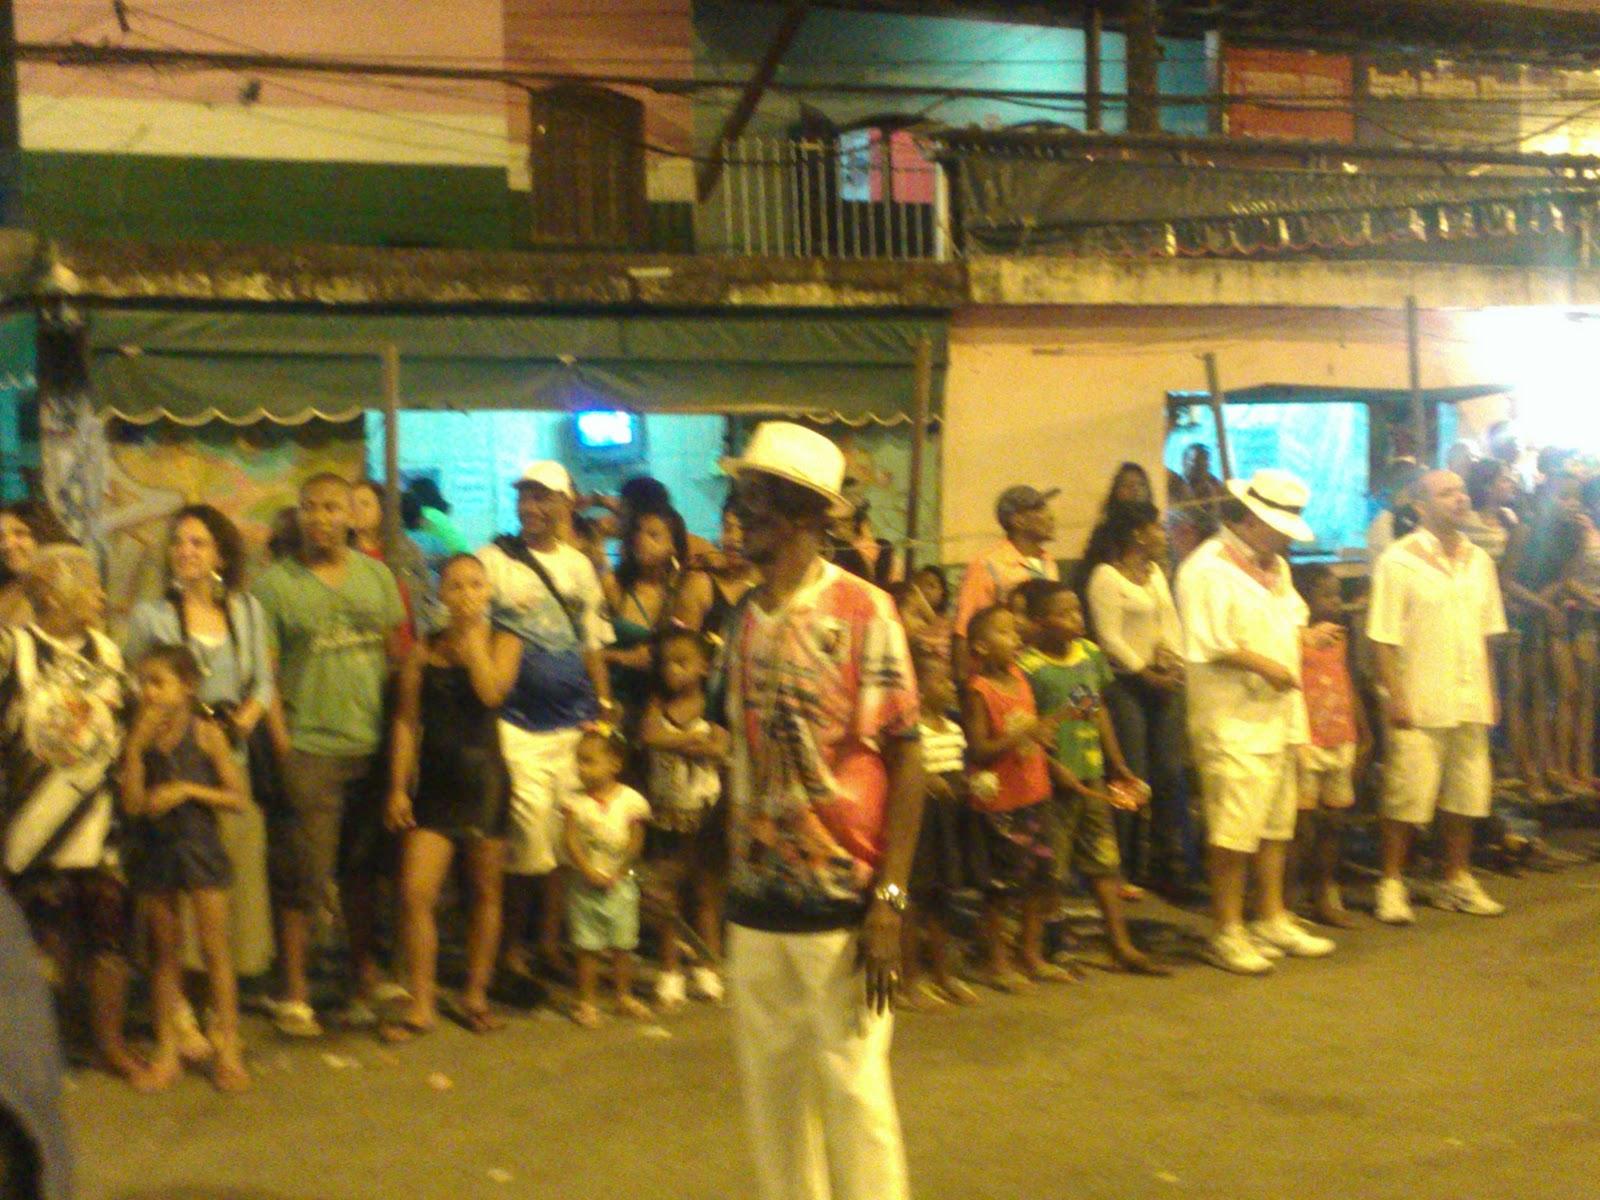 Ensaio Mangueira Rio De Janeiro 2011